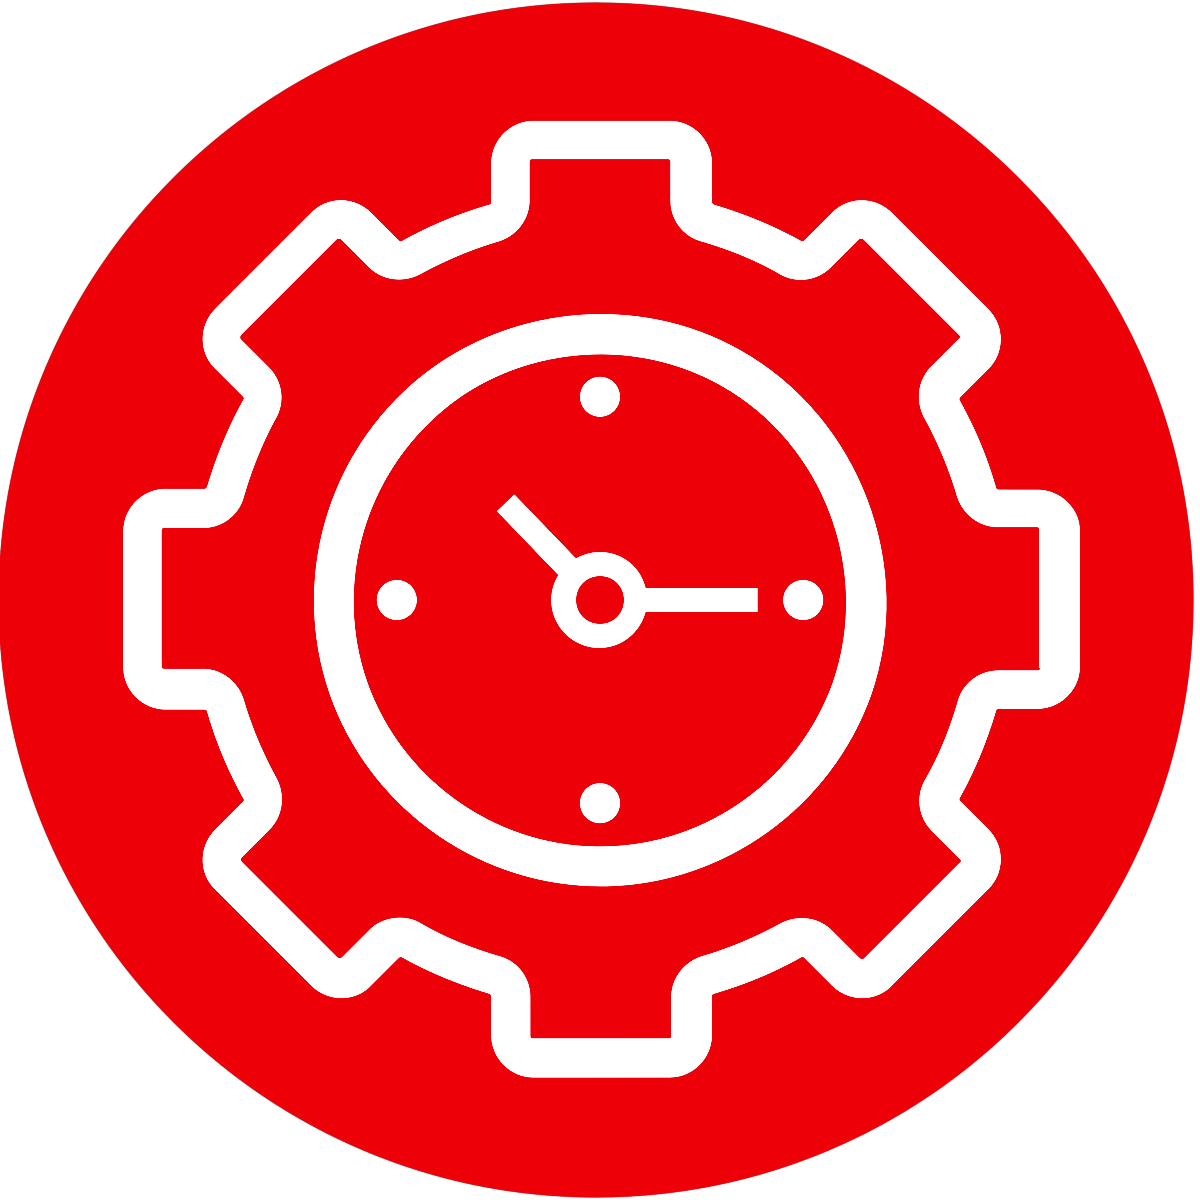 process efficiency icon process efficiency icon hasshe